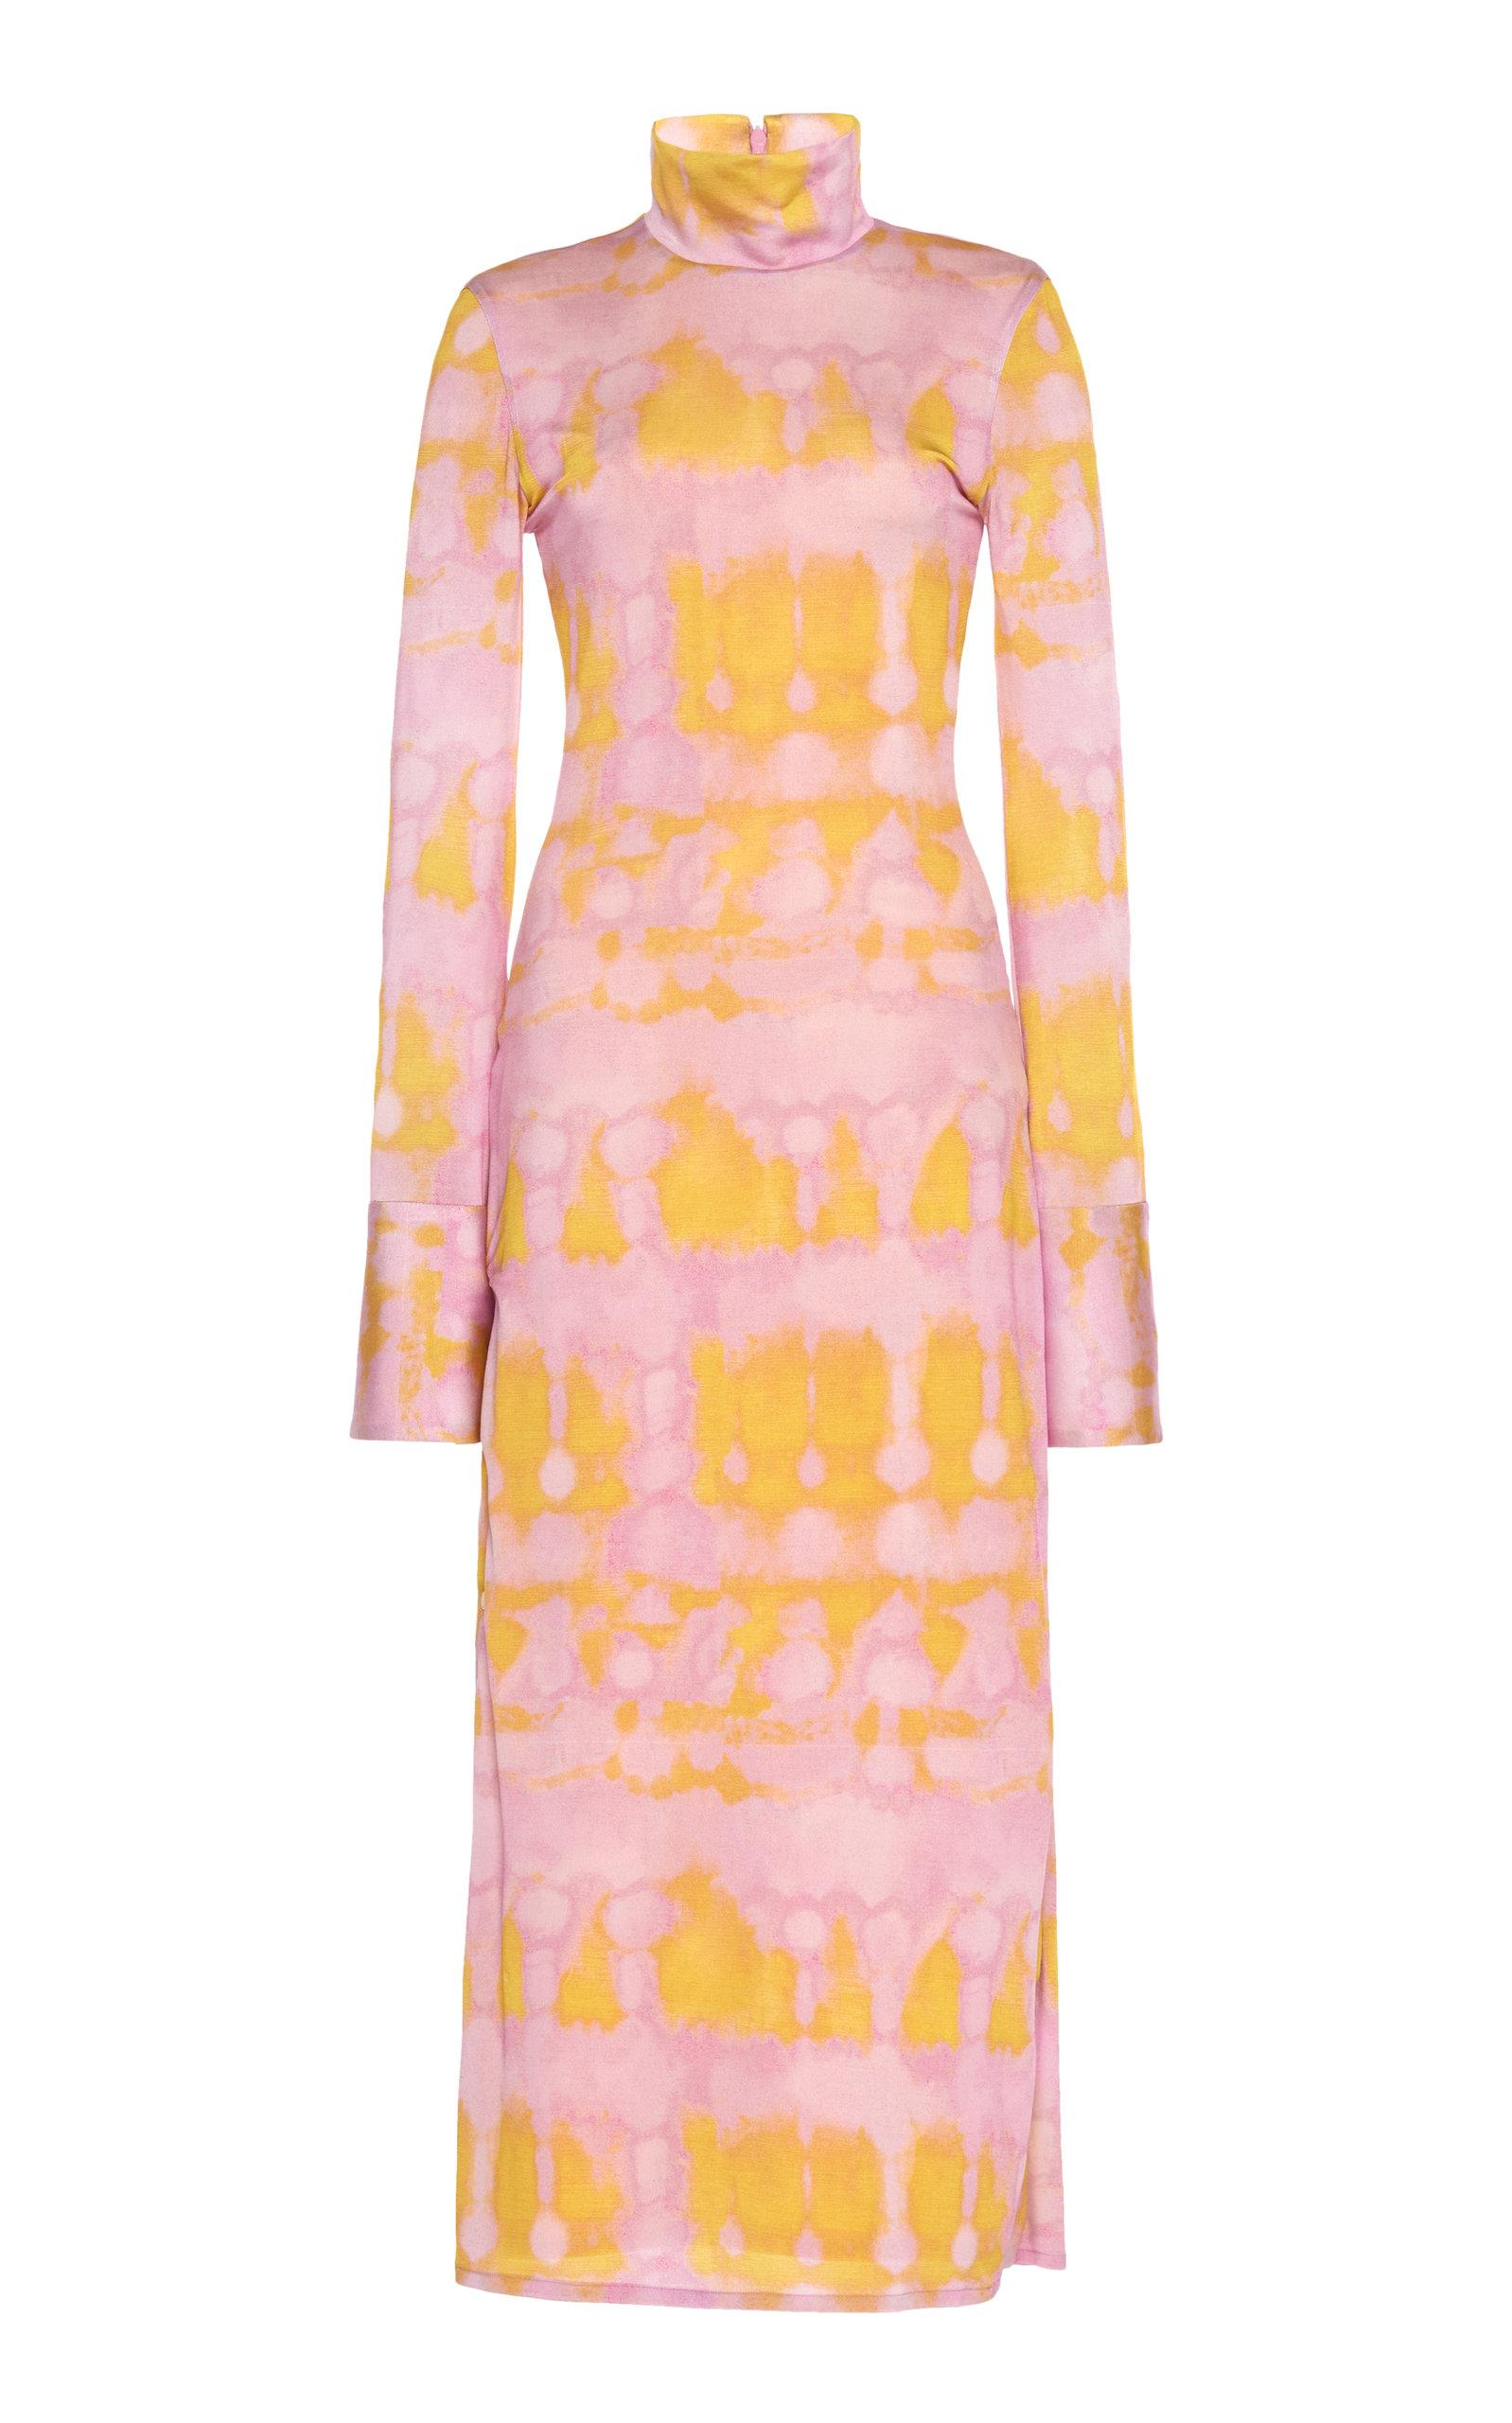 Buy Ellery Seychelles Tie-Dye Stretch-Crepe Dress online, shop Ellery at the best price